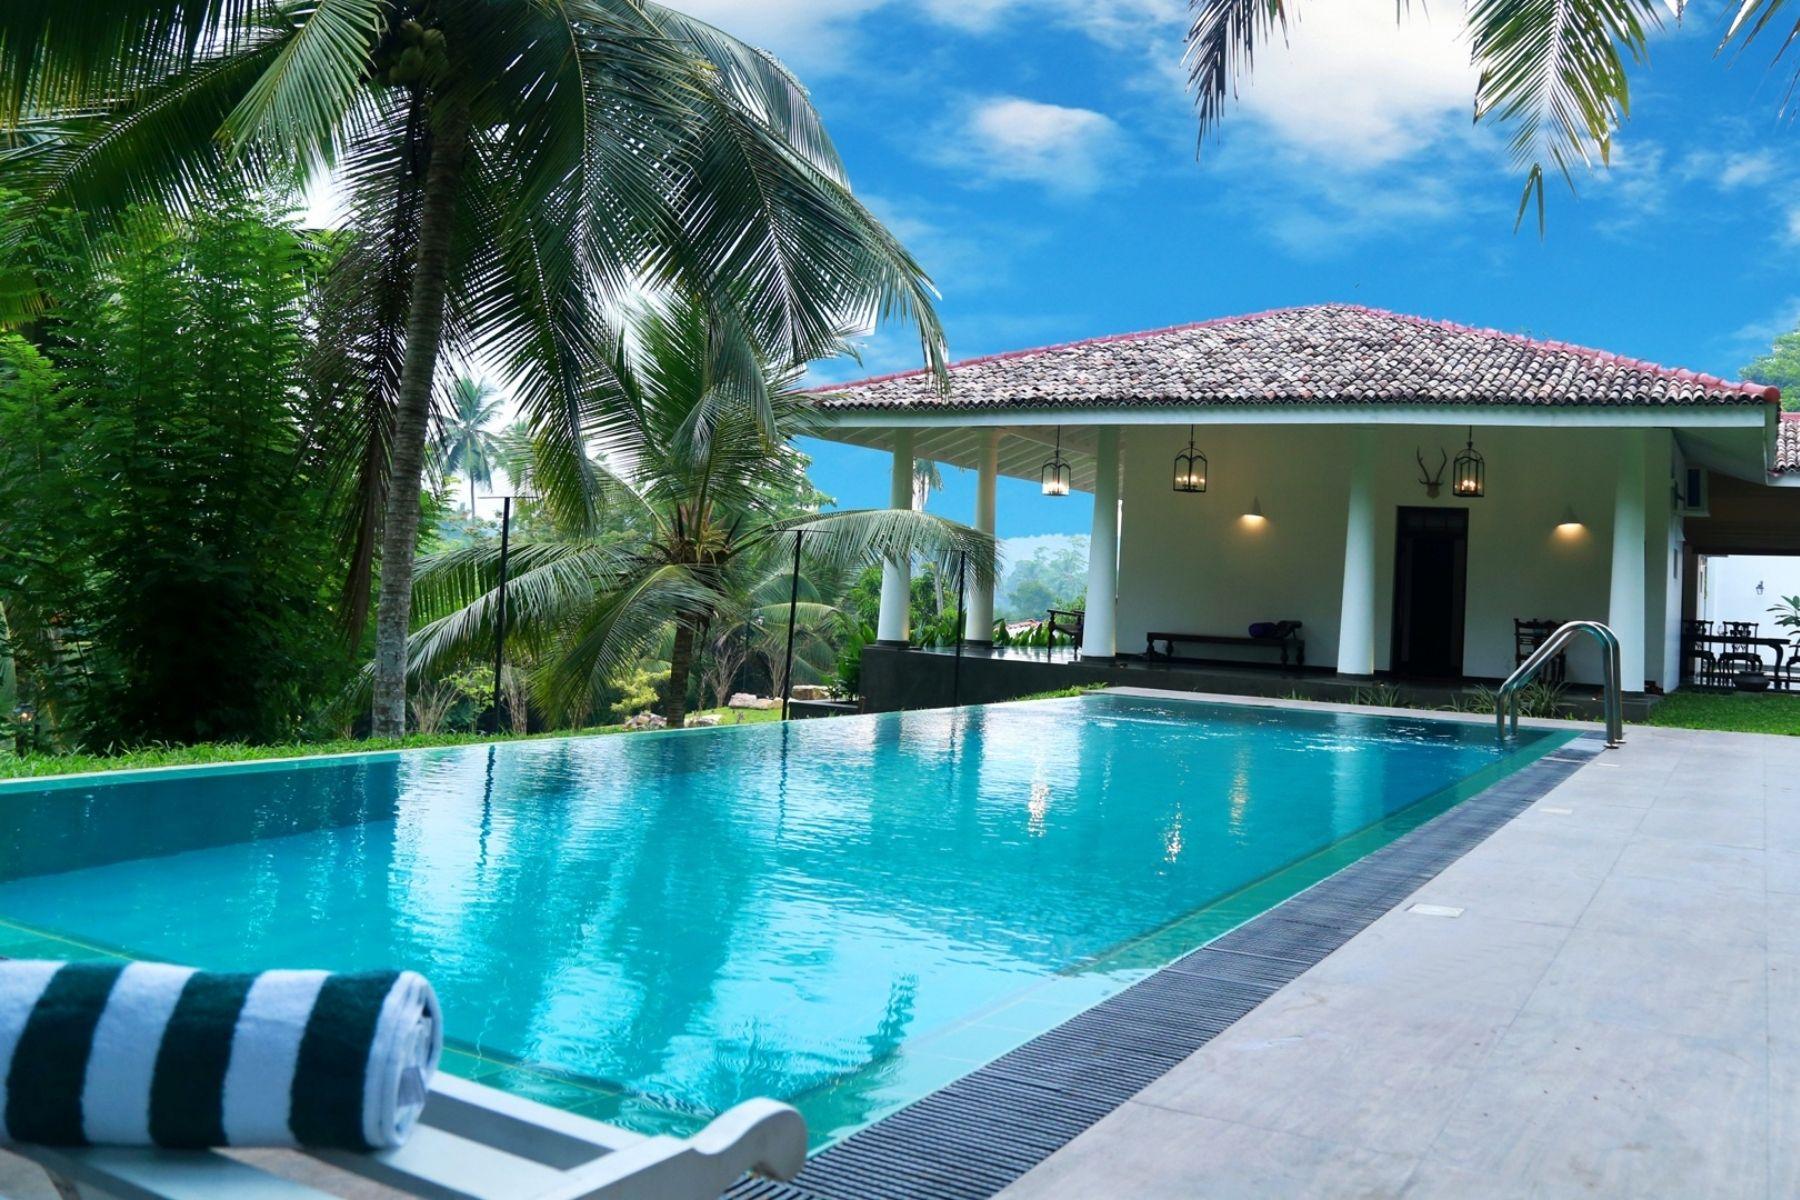 piscina de alvenaria